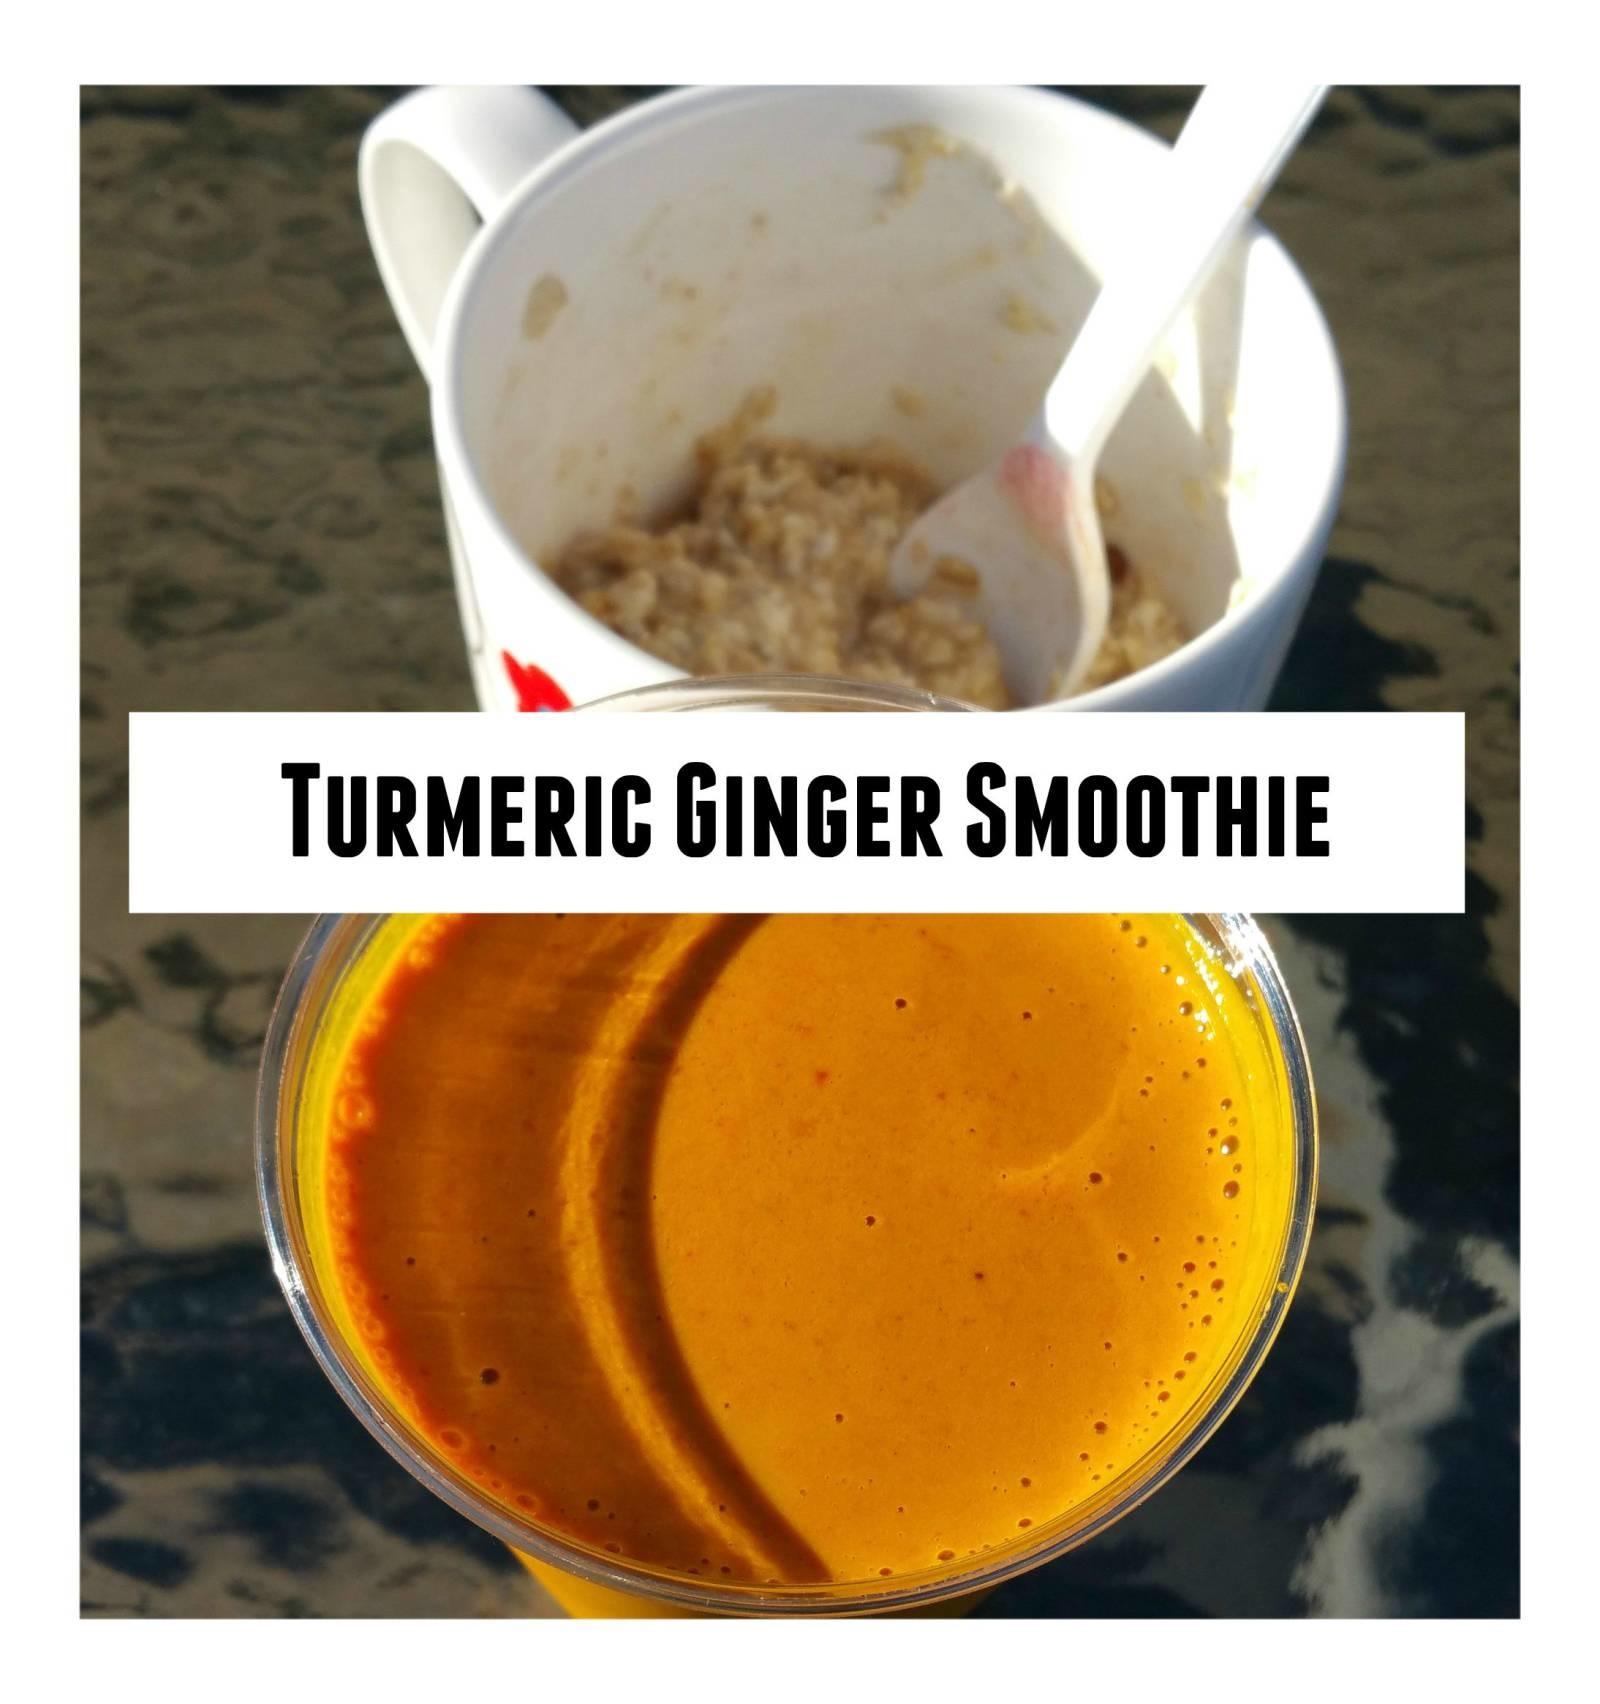 Healing Smoothie- Turmeric Ginger Smoothie